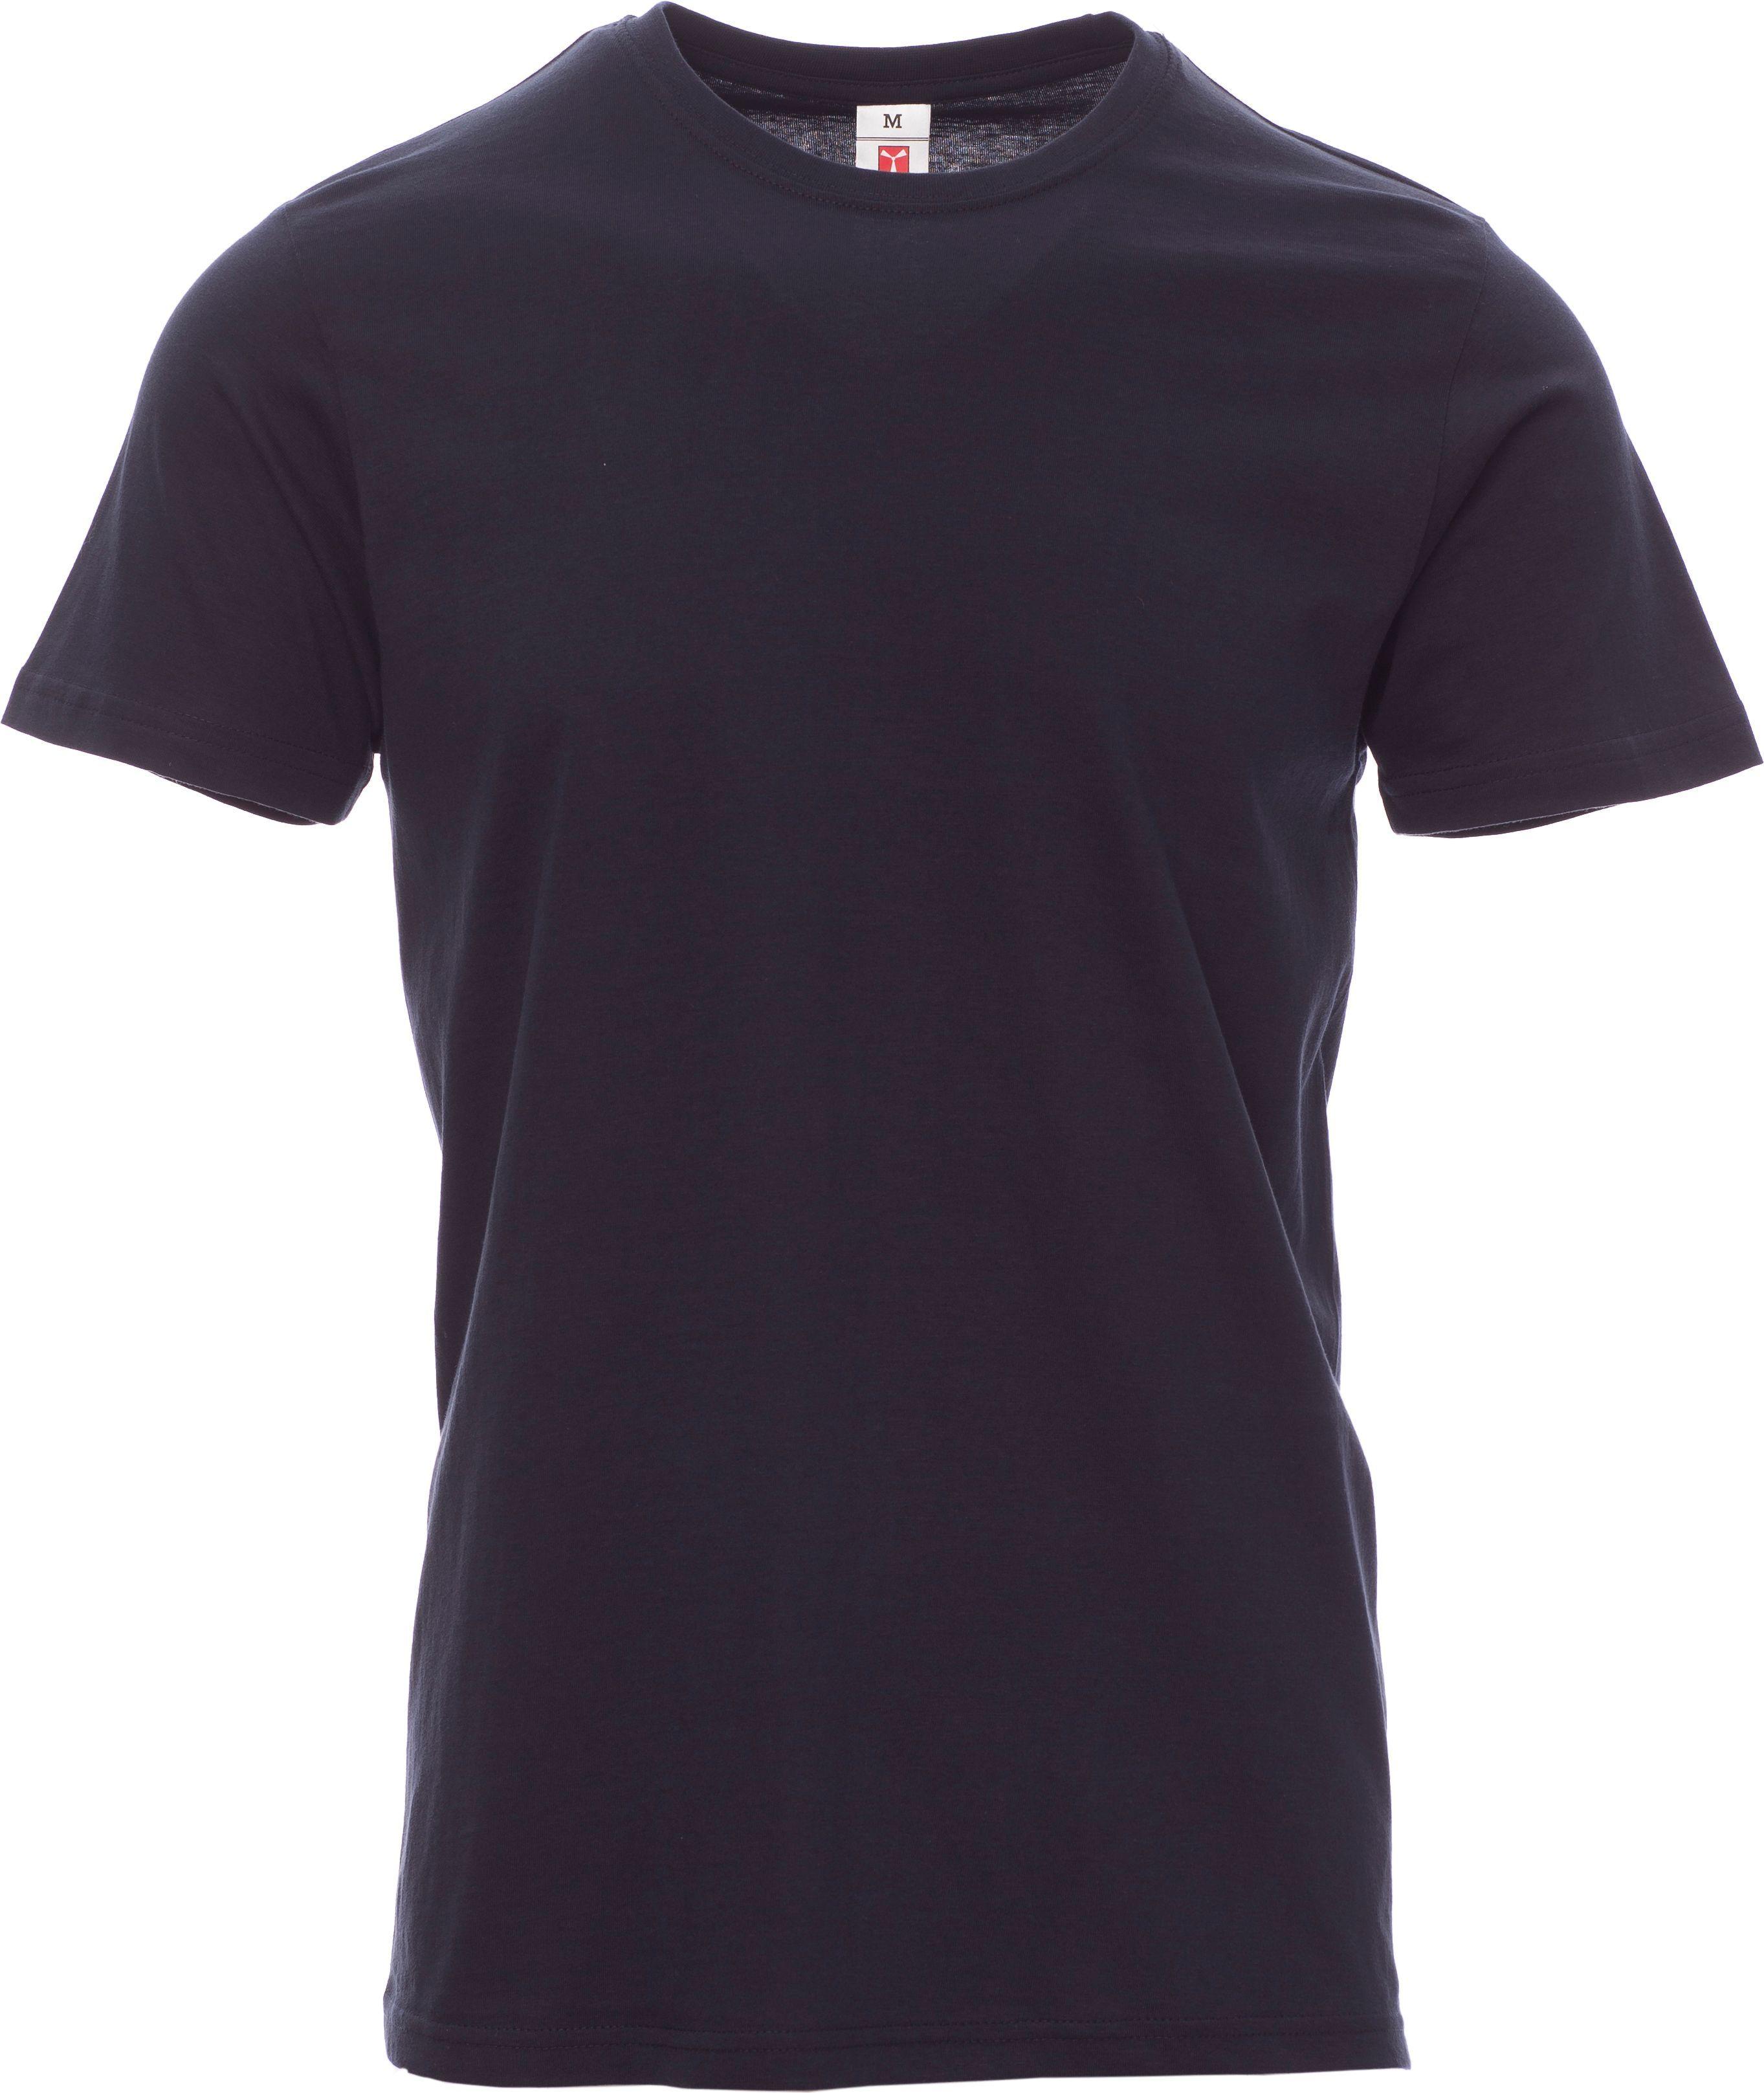 Tee-shirt Print - 32-1148-14